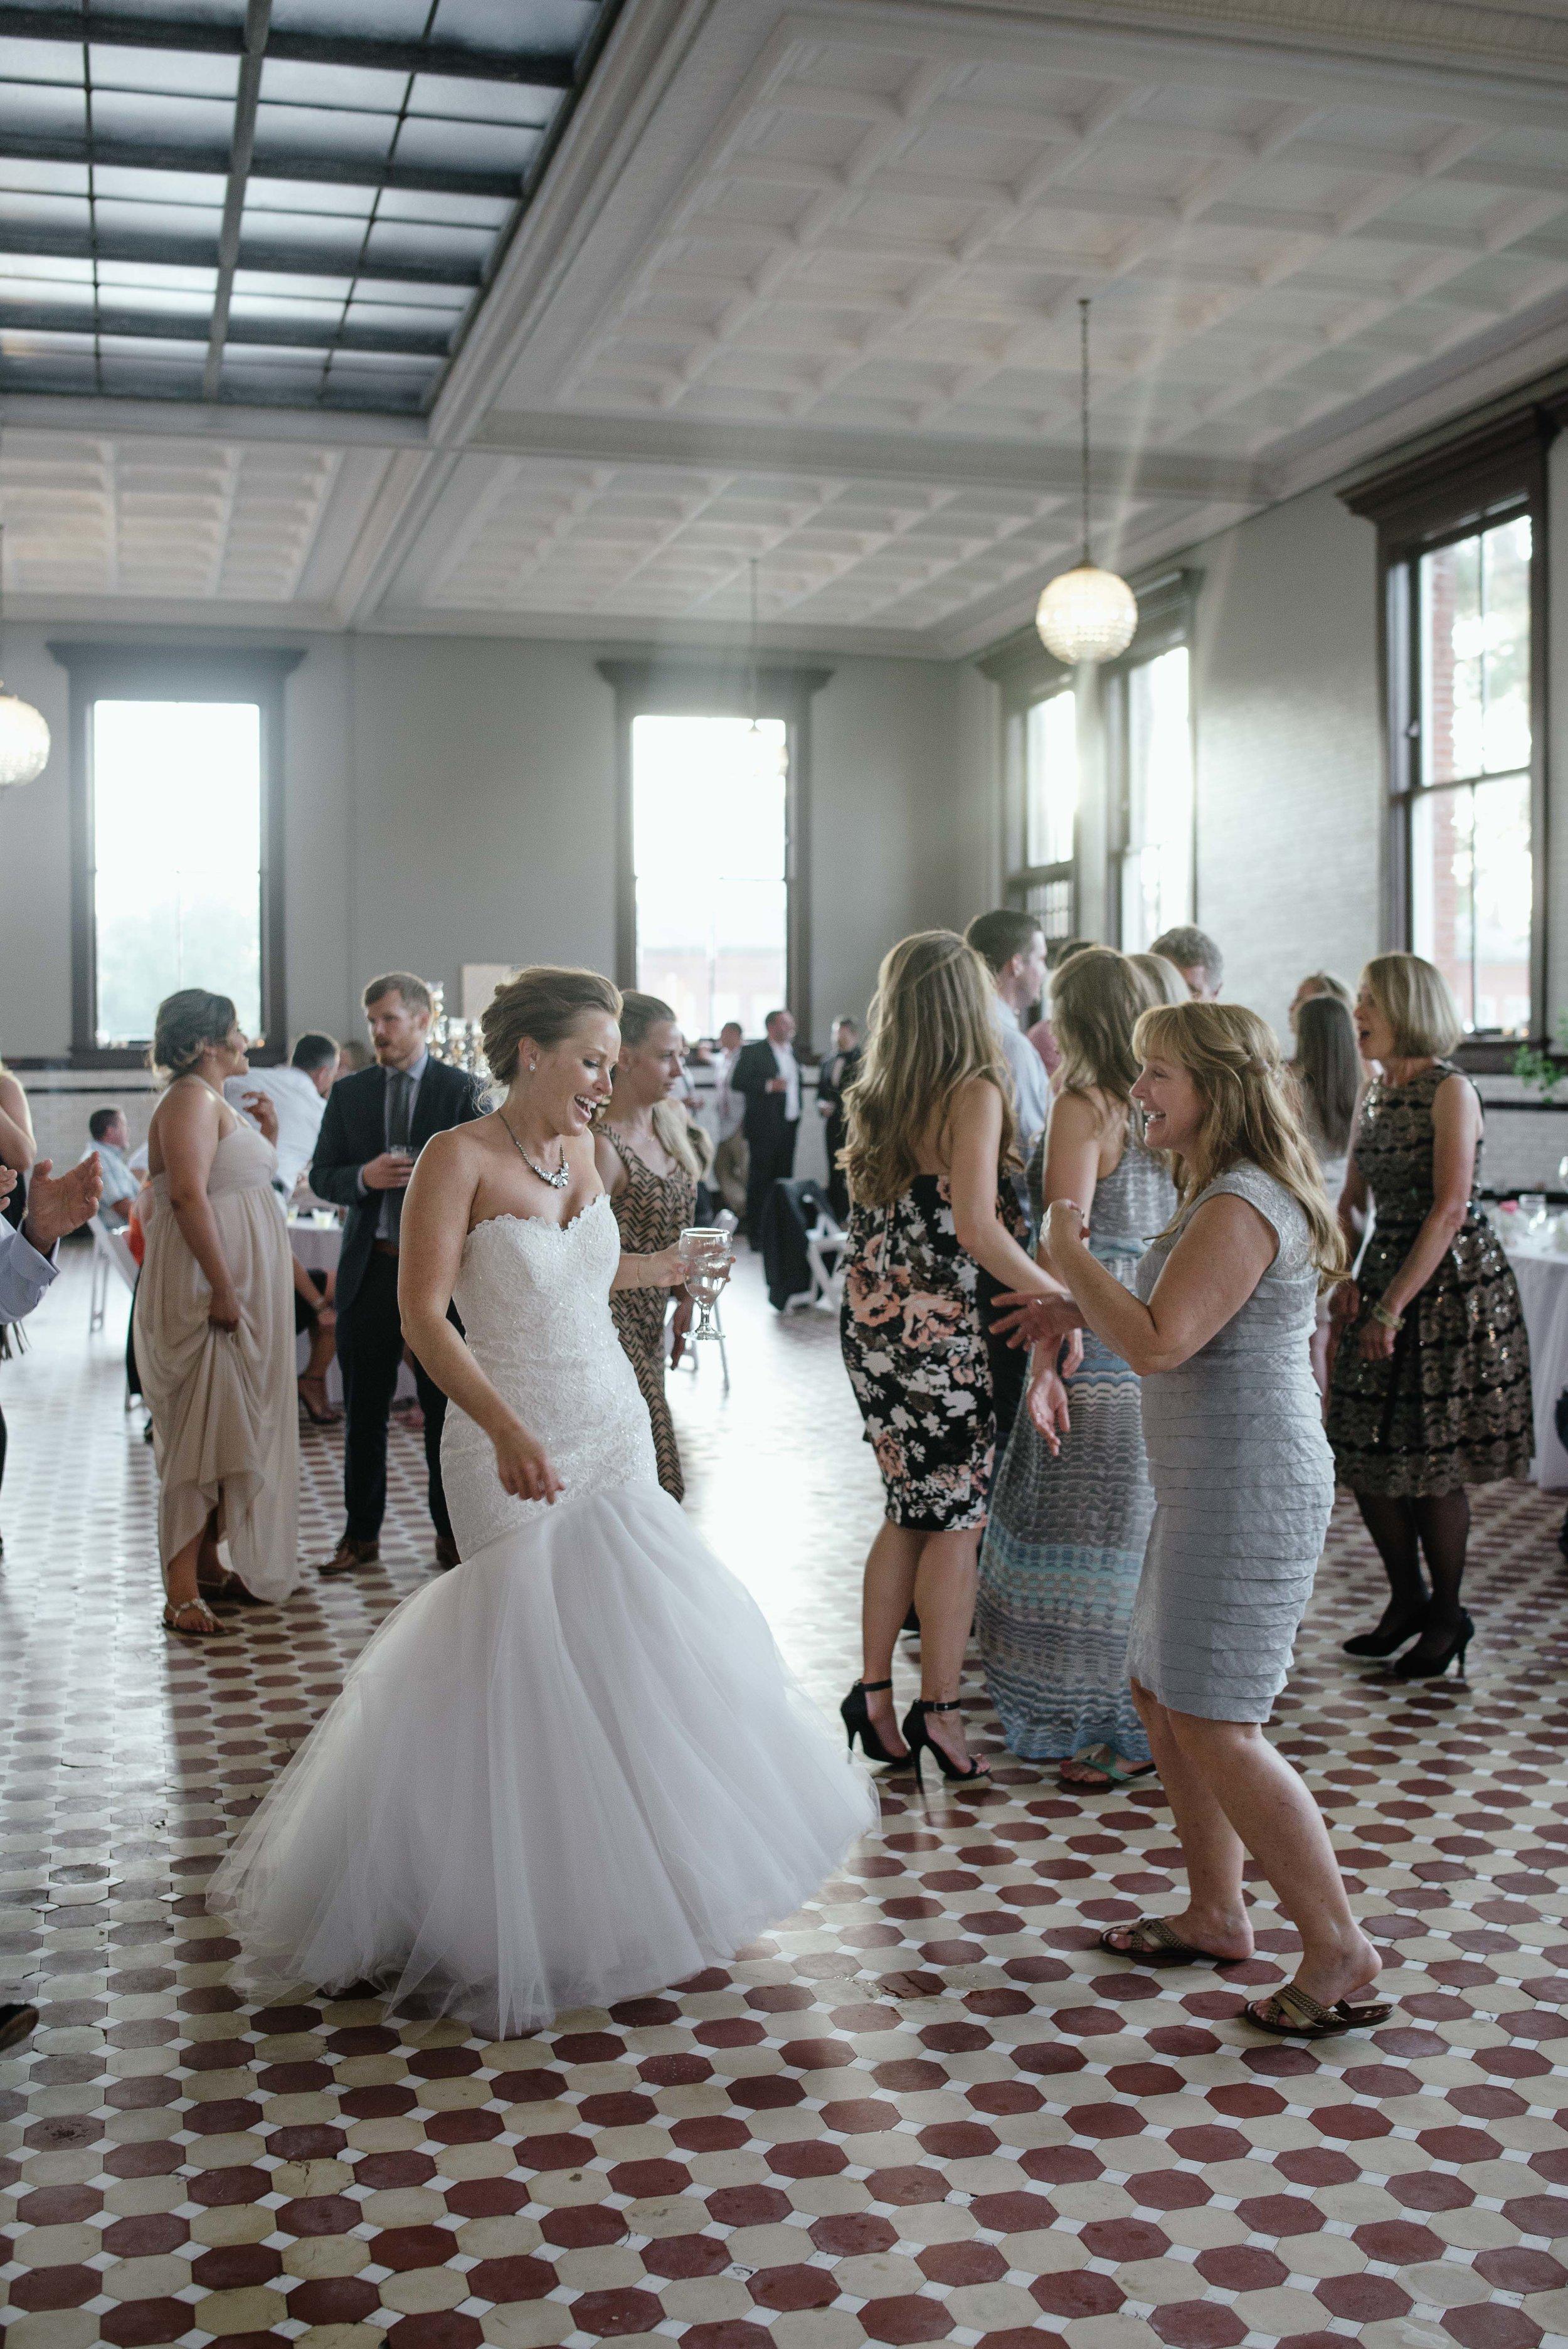 Mina-Steve-Blog-Indianapolis-Wedding-170.jpg